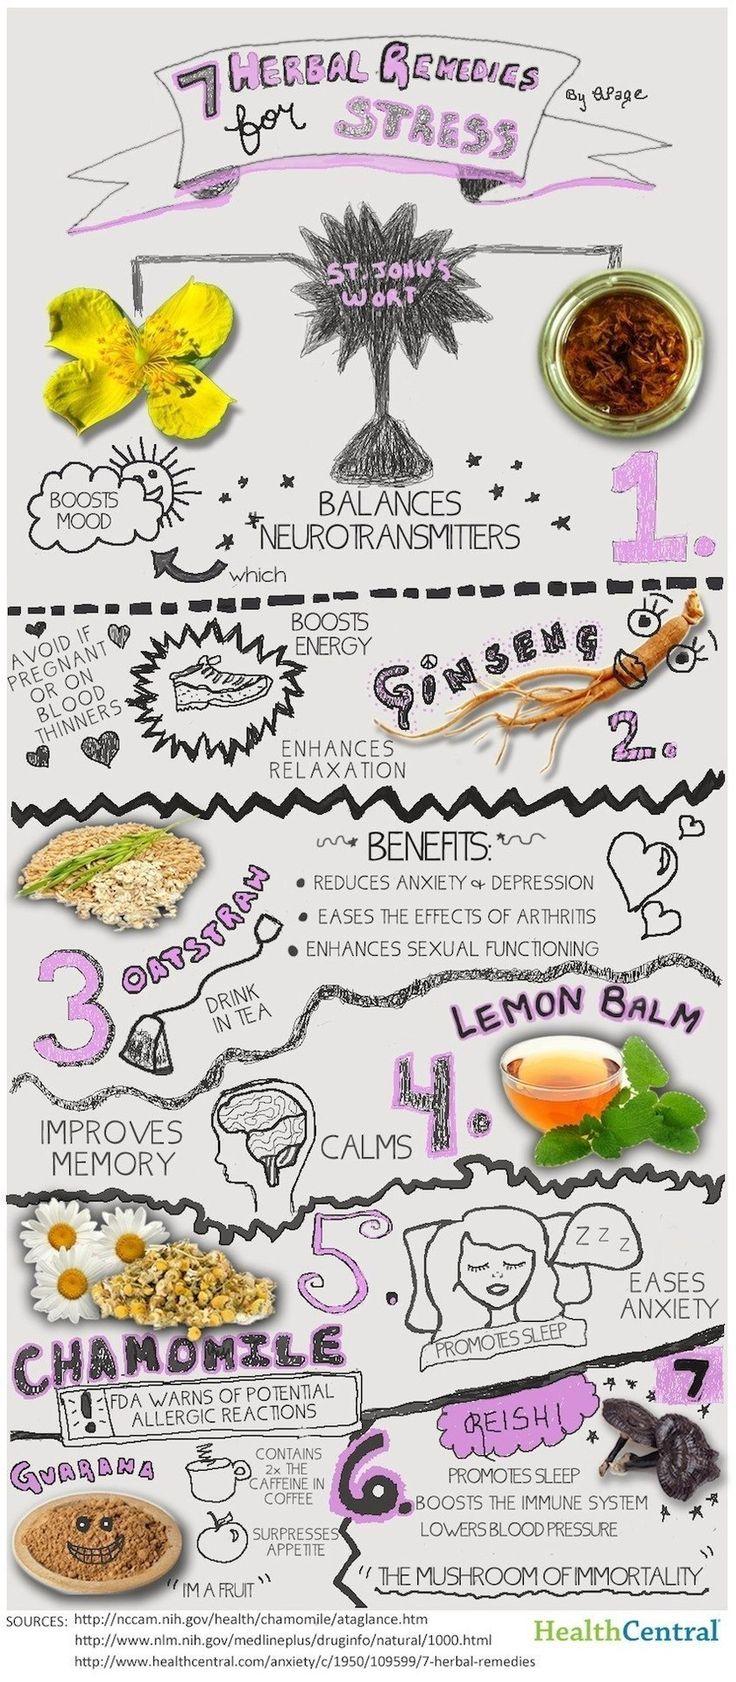 7 #Herbal Remedies For Stress - mäkikuismasta apu lievään masennukseen #masennus #stressi #mäkikuisma